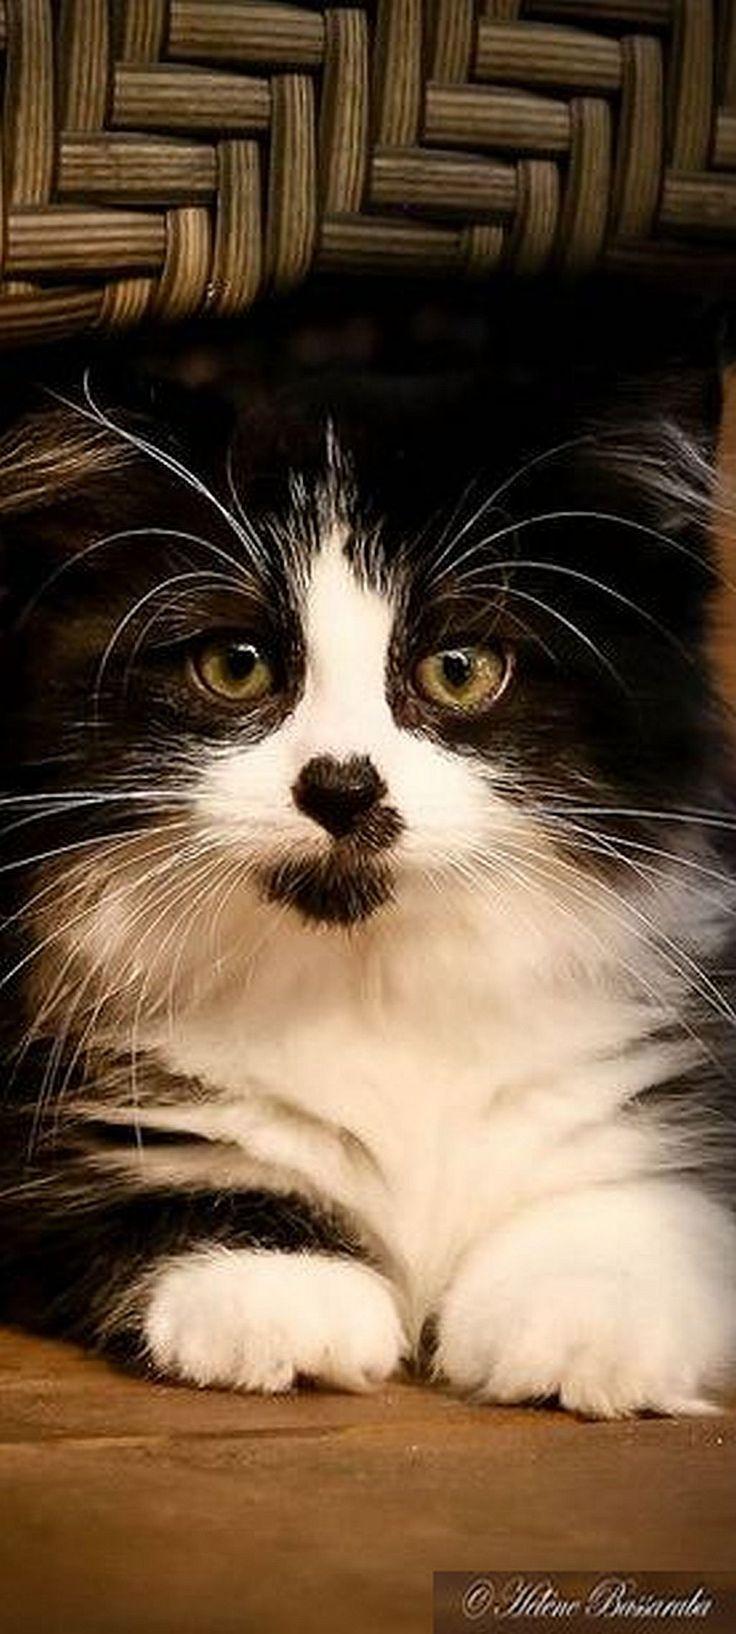 beautiful kitty cat  #von Helene Bassaraba -- Flickr.com